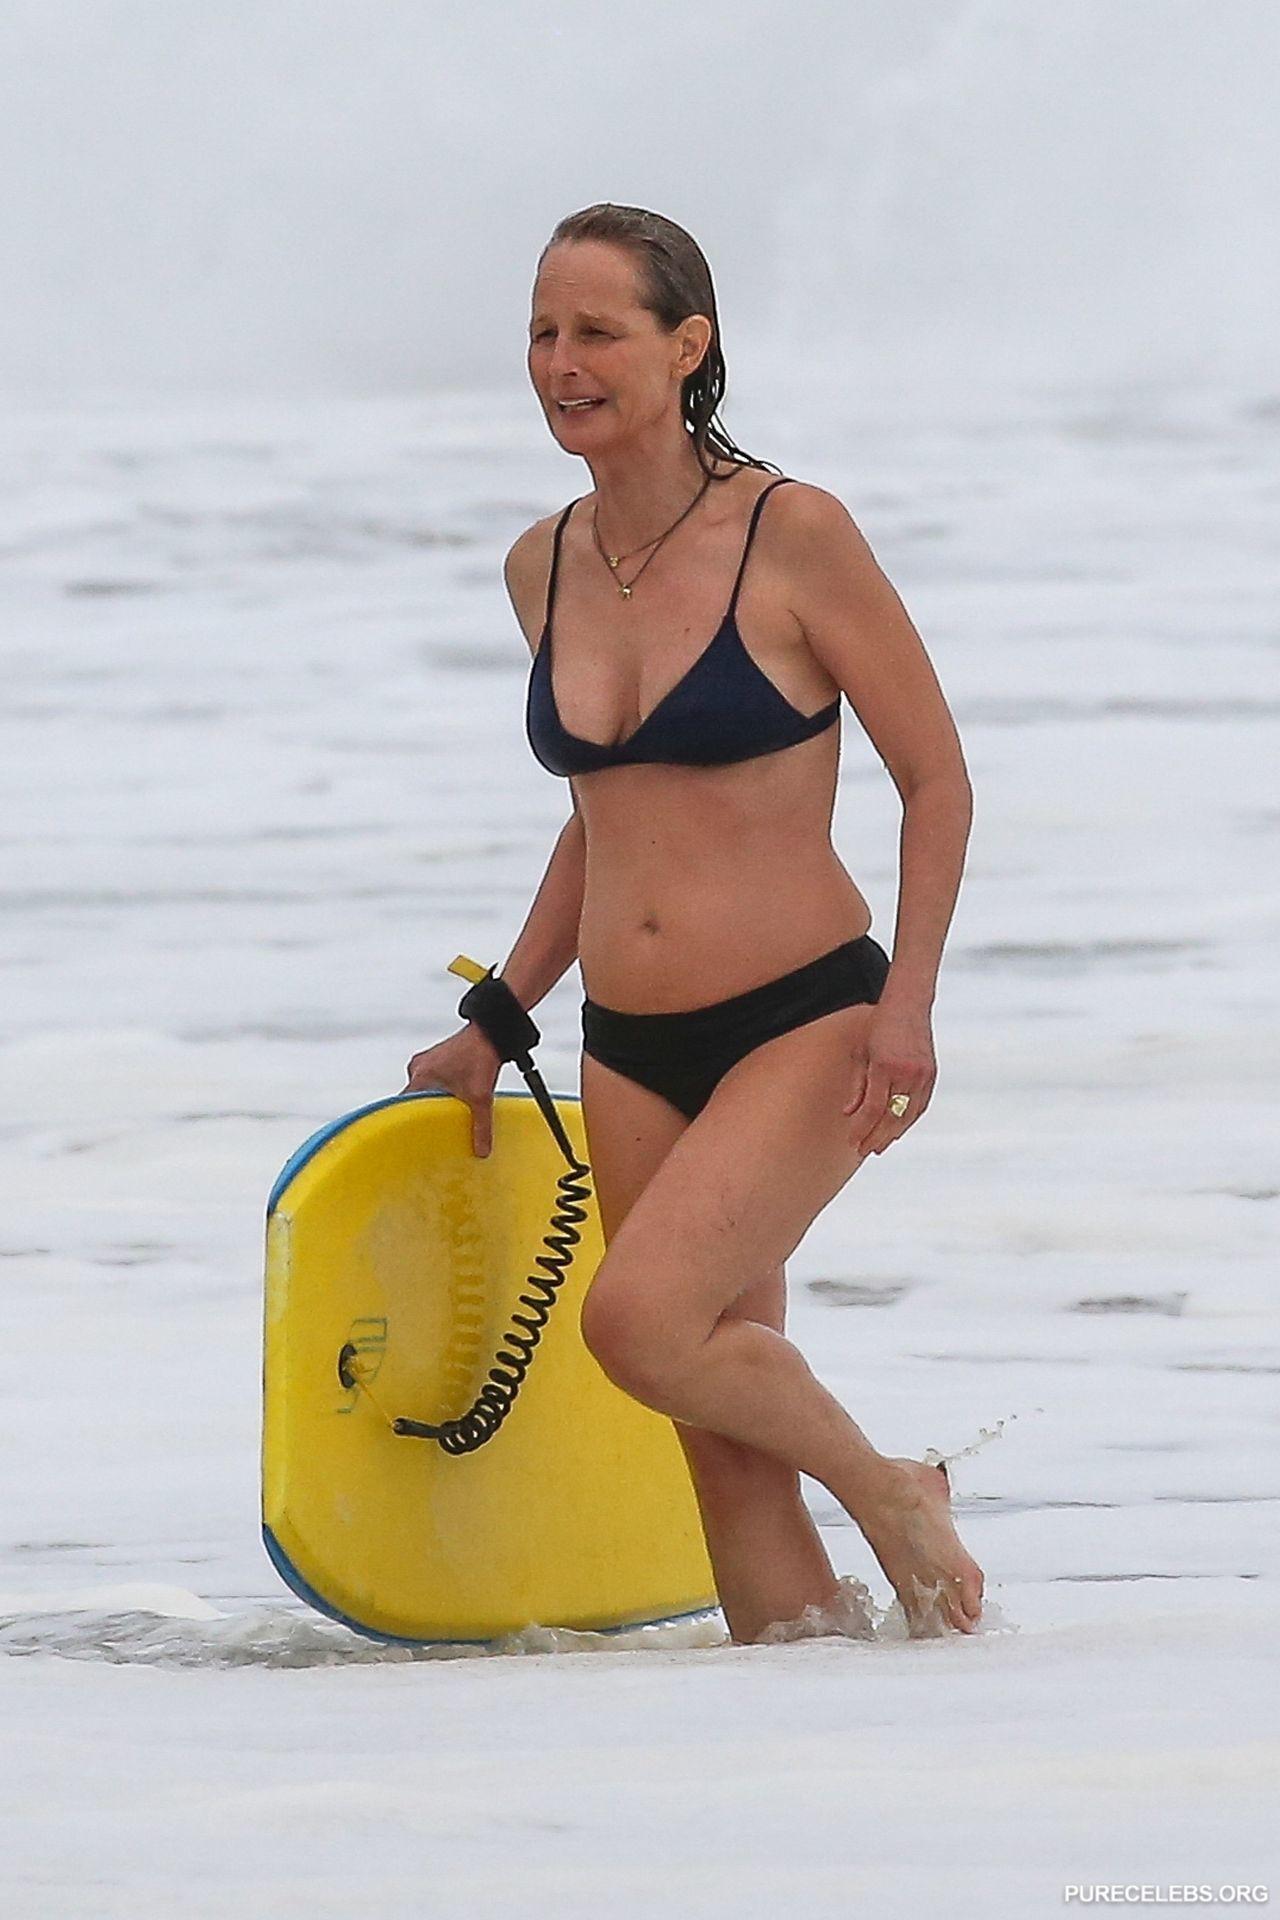 Helen Hunt Paparazzi Bikini Beach Photos - NuCelebs.com